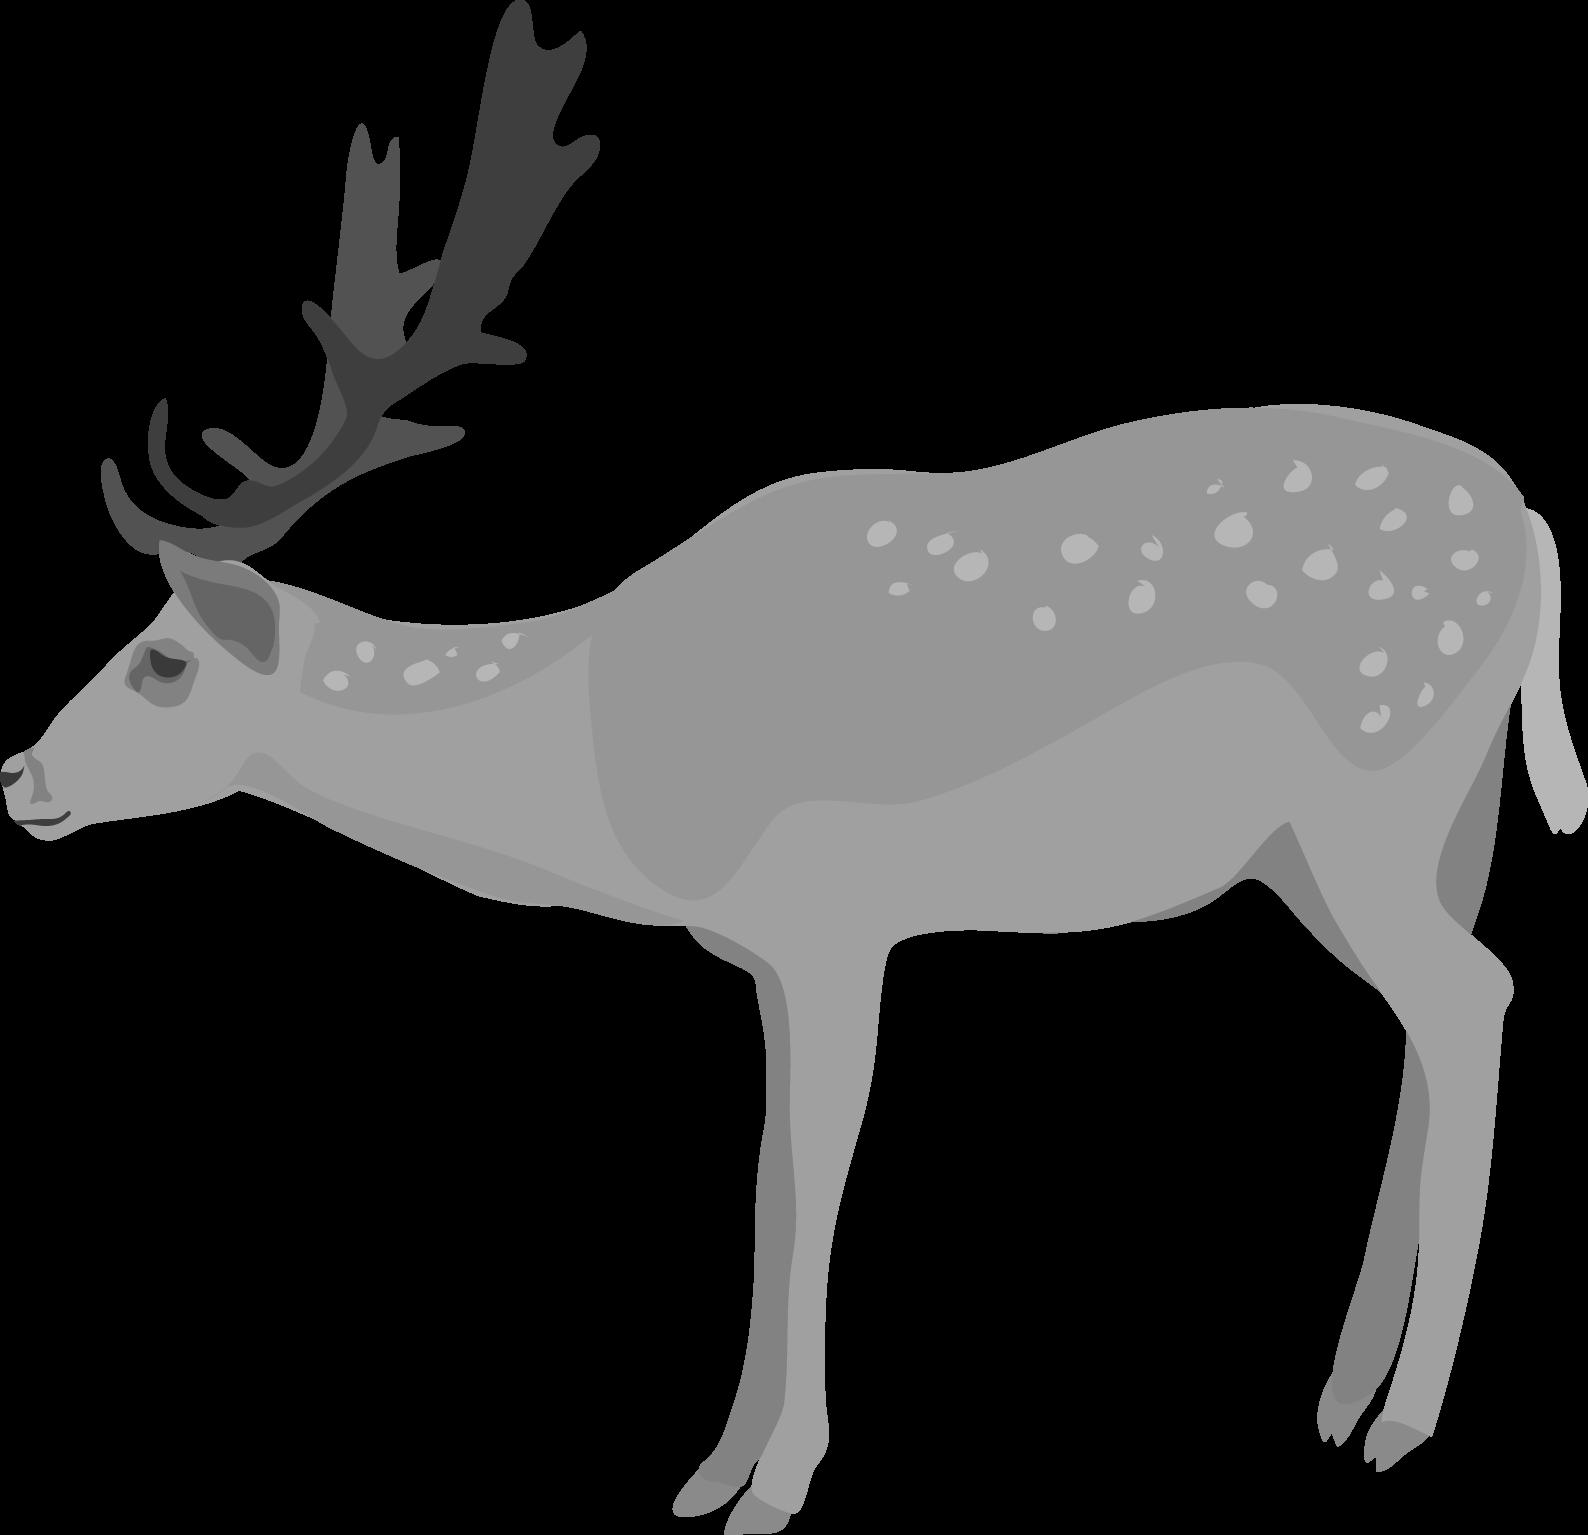 Clipart fall deer. Cute clipartblack com animal